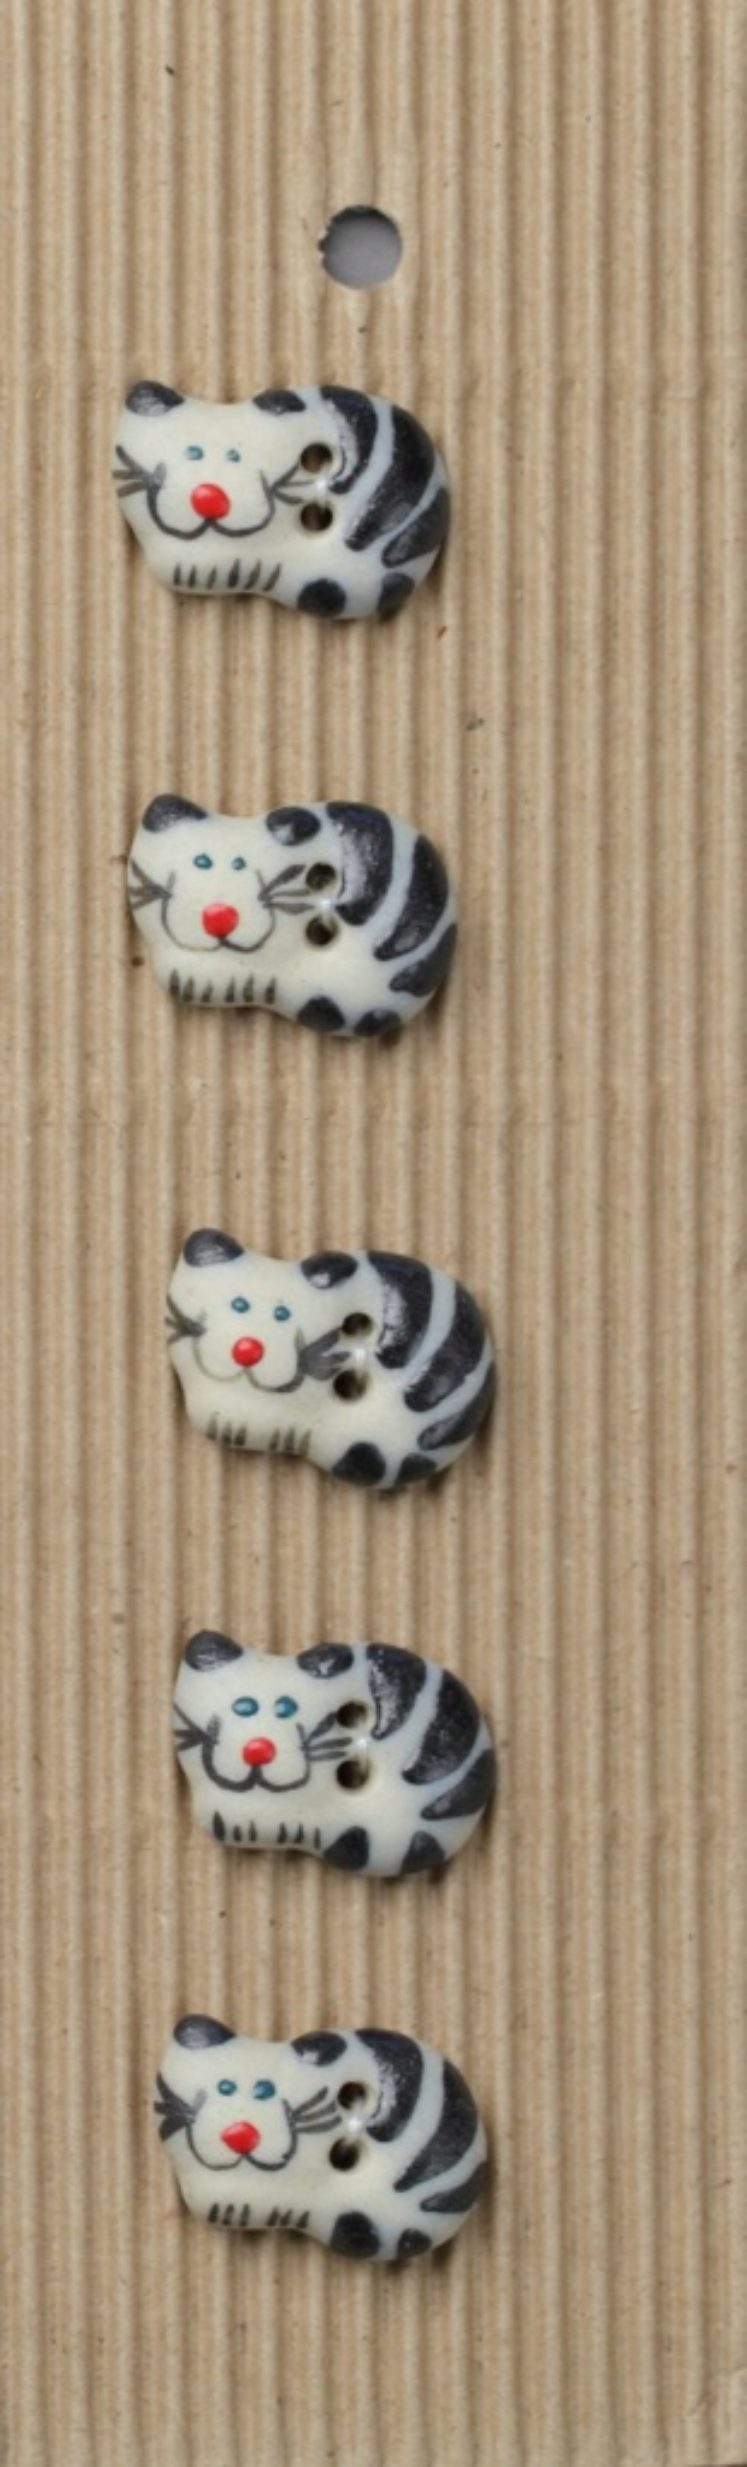 Ceramic Buttons – Black Cats L34